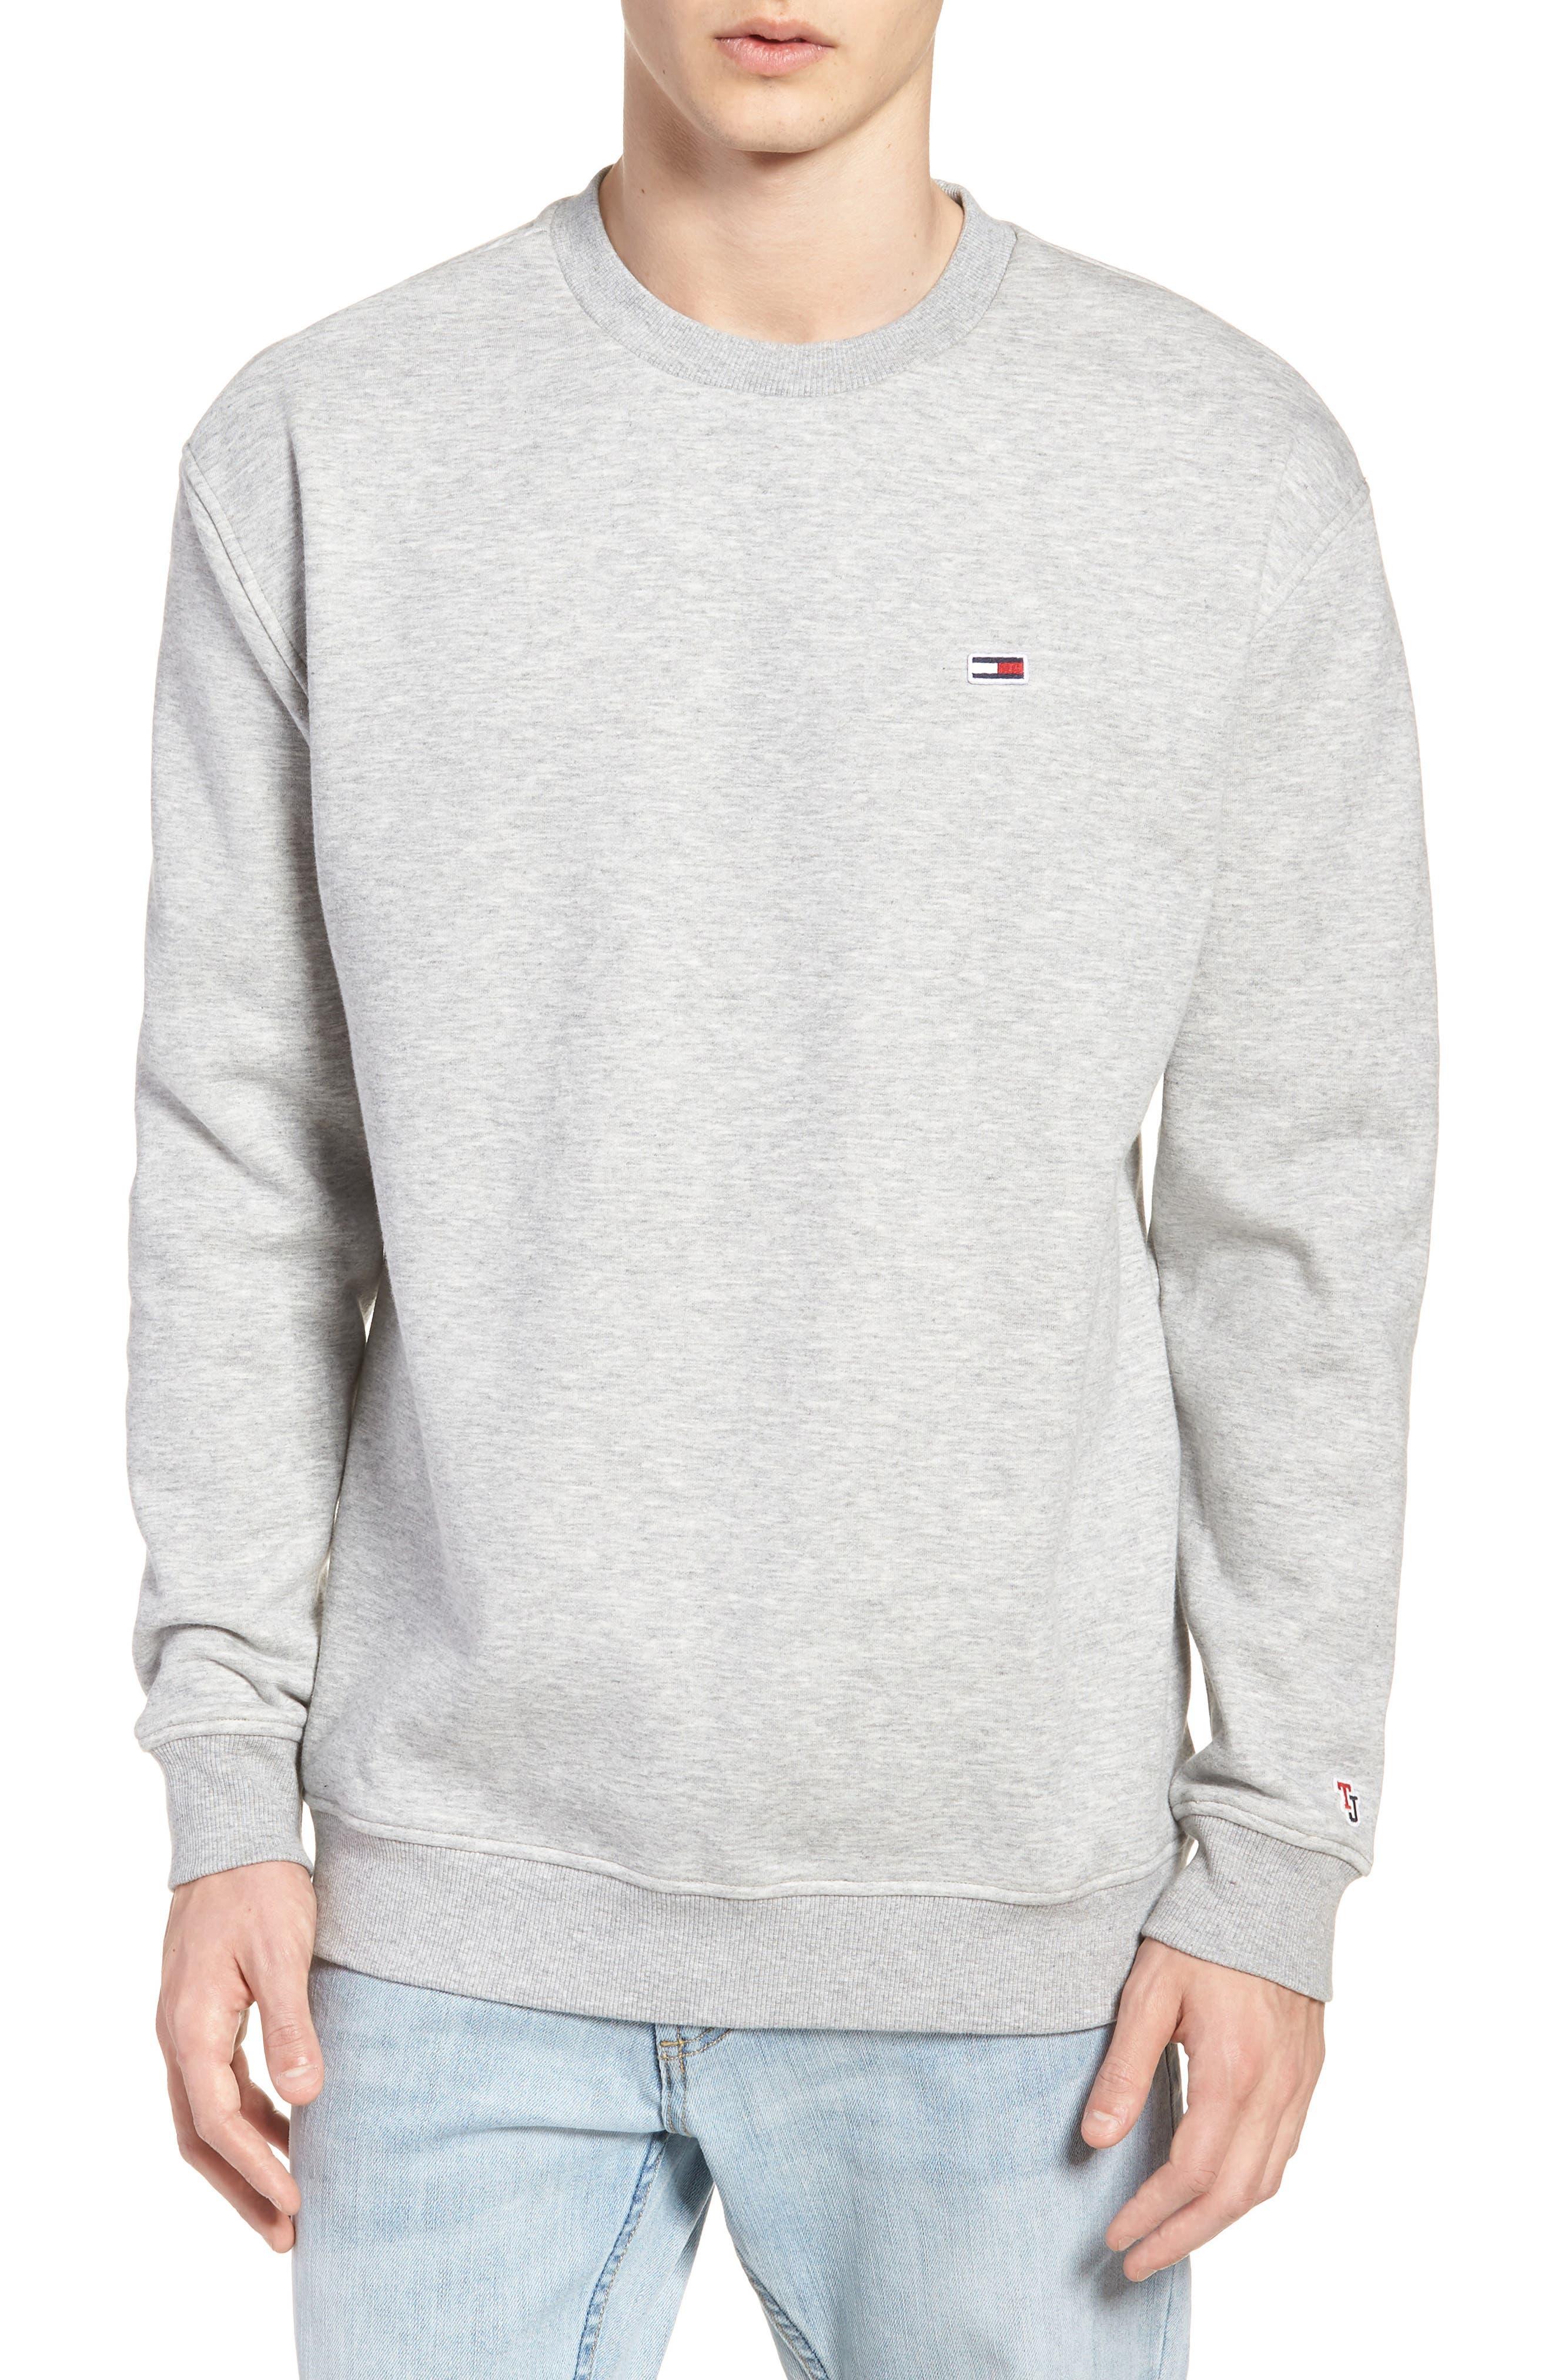 Tommy Classics Crewneck Sweatshirt,                             Main thumbnail 1, color,                             LIGHT GREY HEATHER